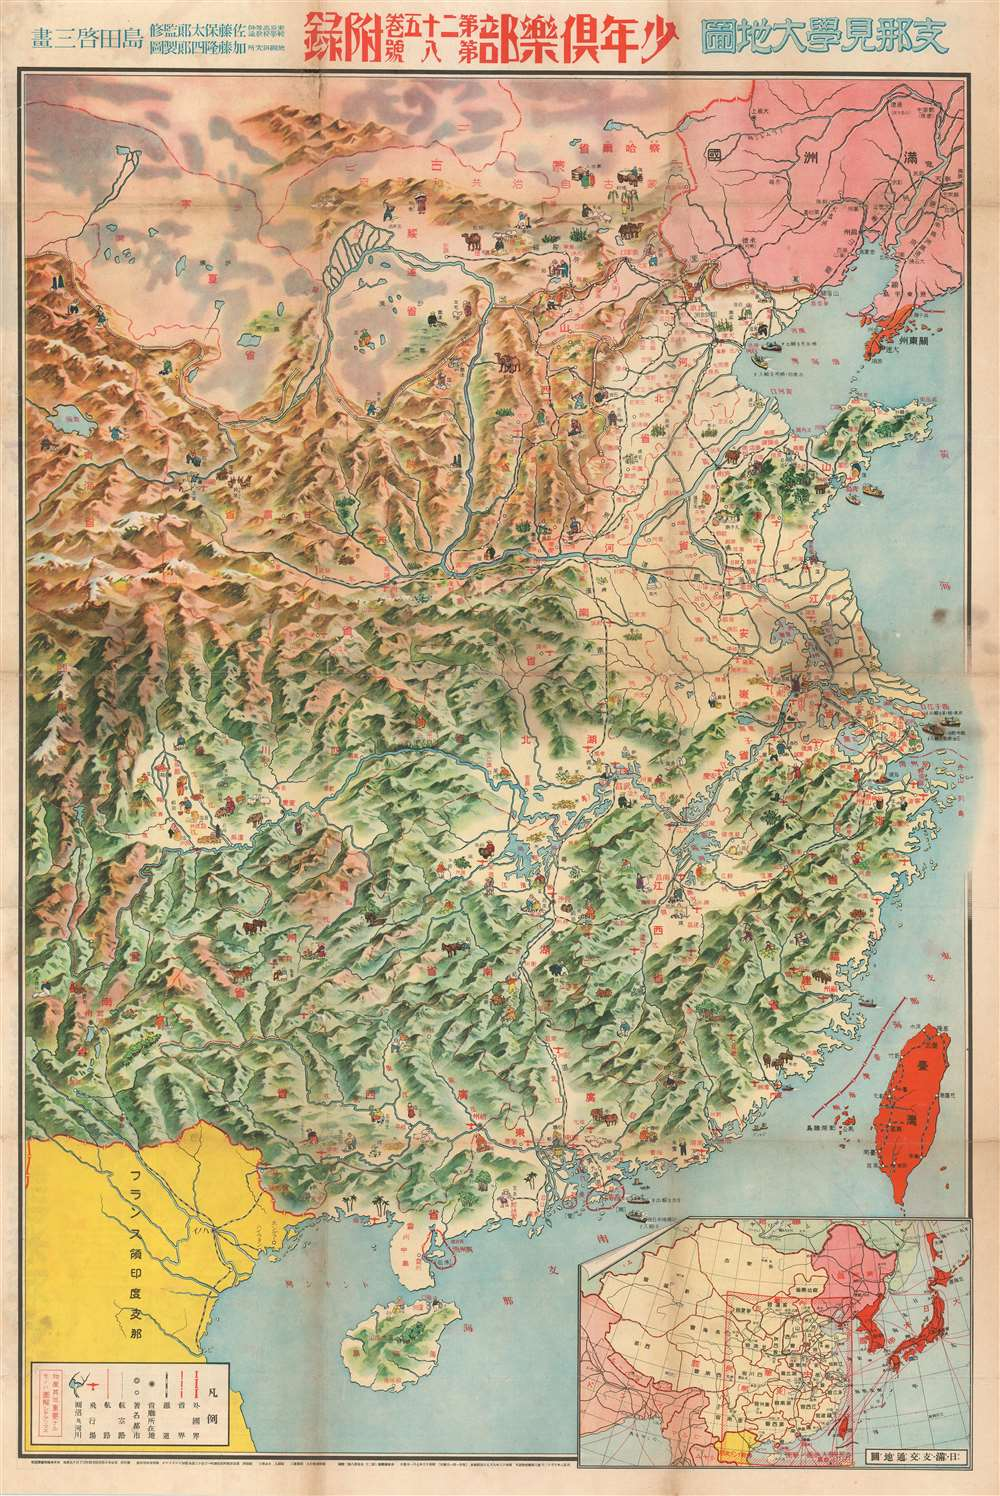 支那見學大地圖 / Large Map of China.